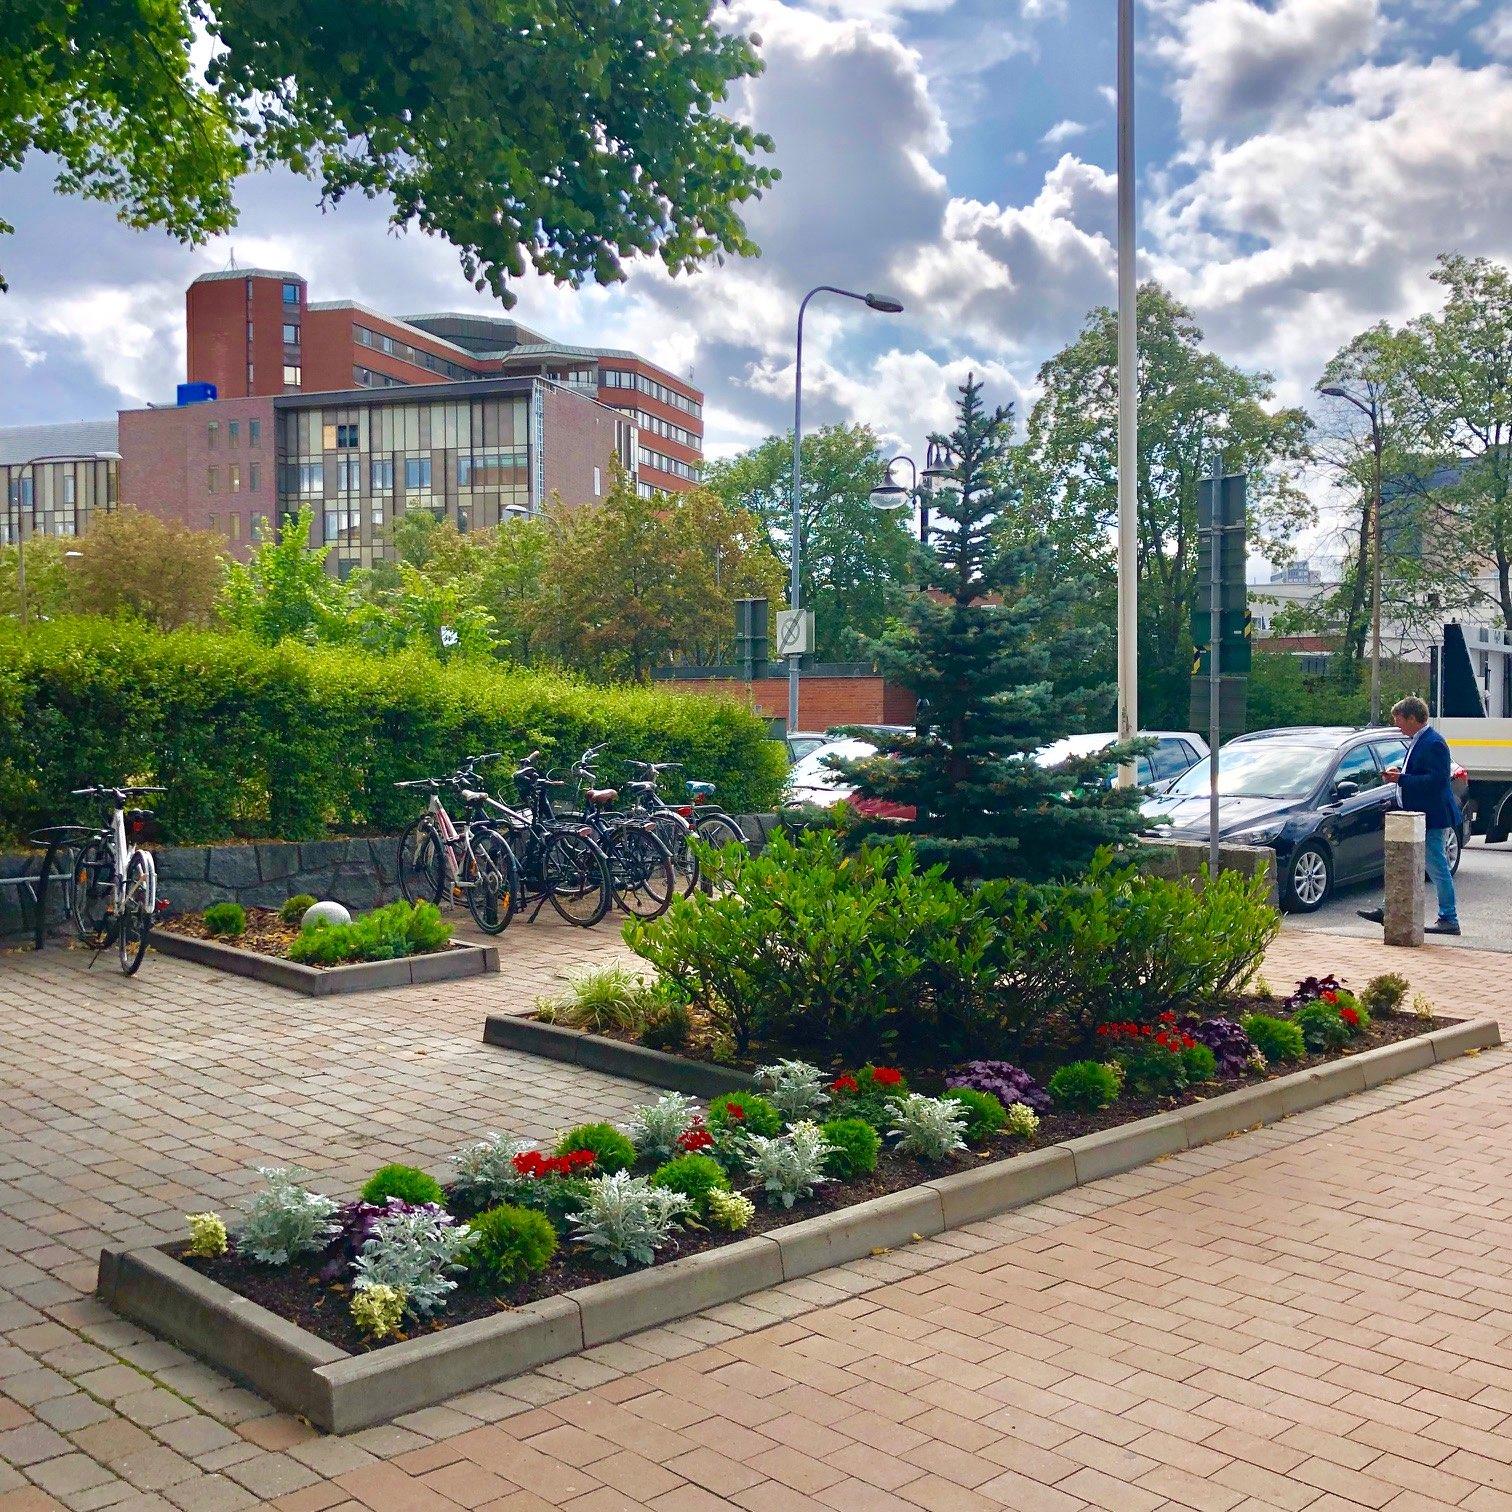 Outside Idun Barnklinik